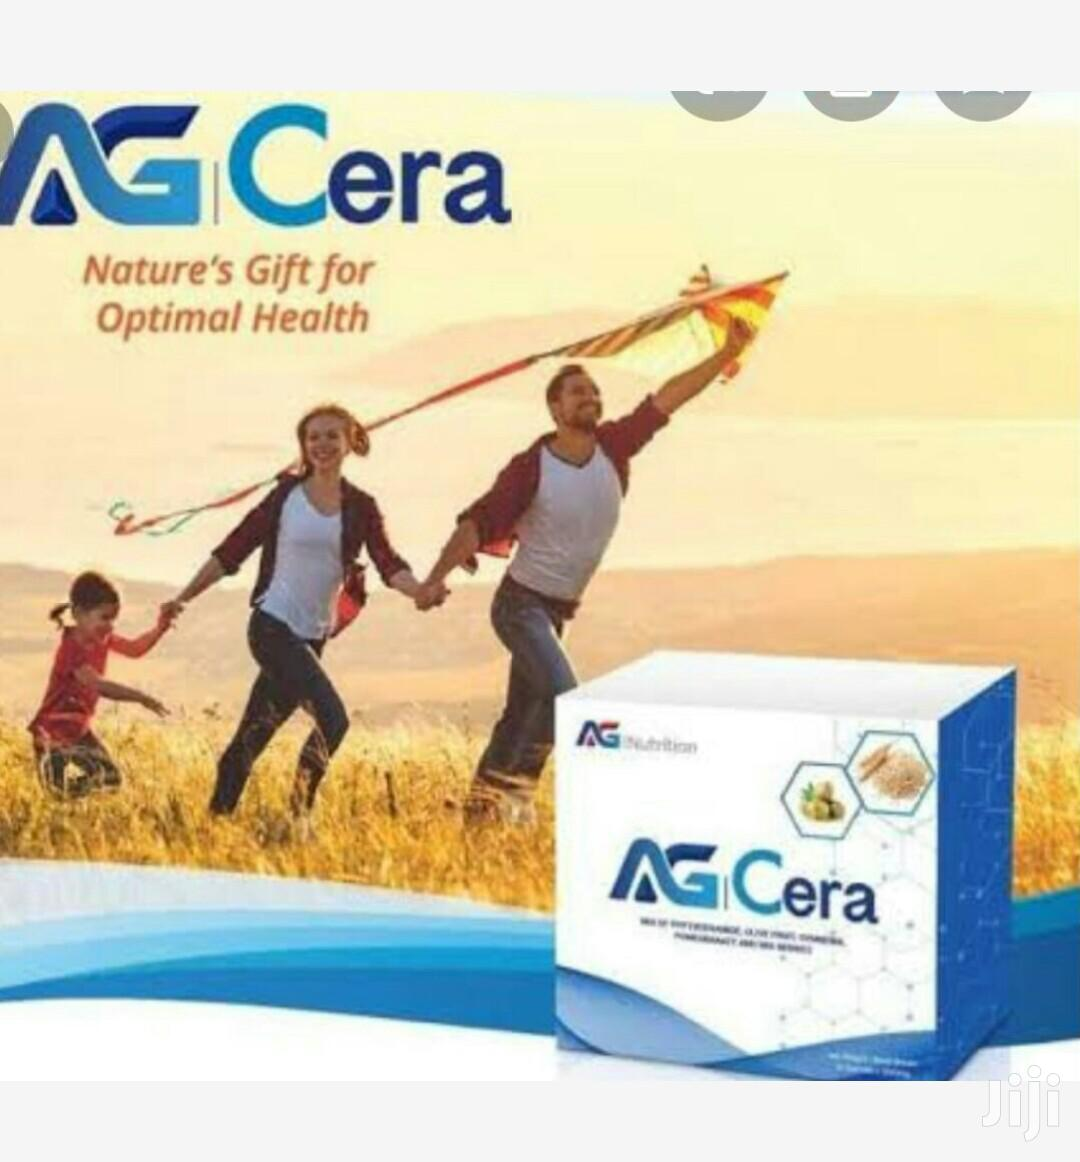 Agcera Nutrition Supplement- 2 Boxes Package | Vitamins & Supplements for sale in Utawala, Nairobi, Kenya